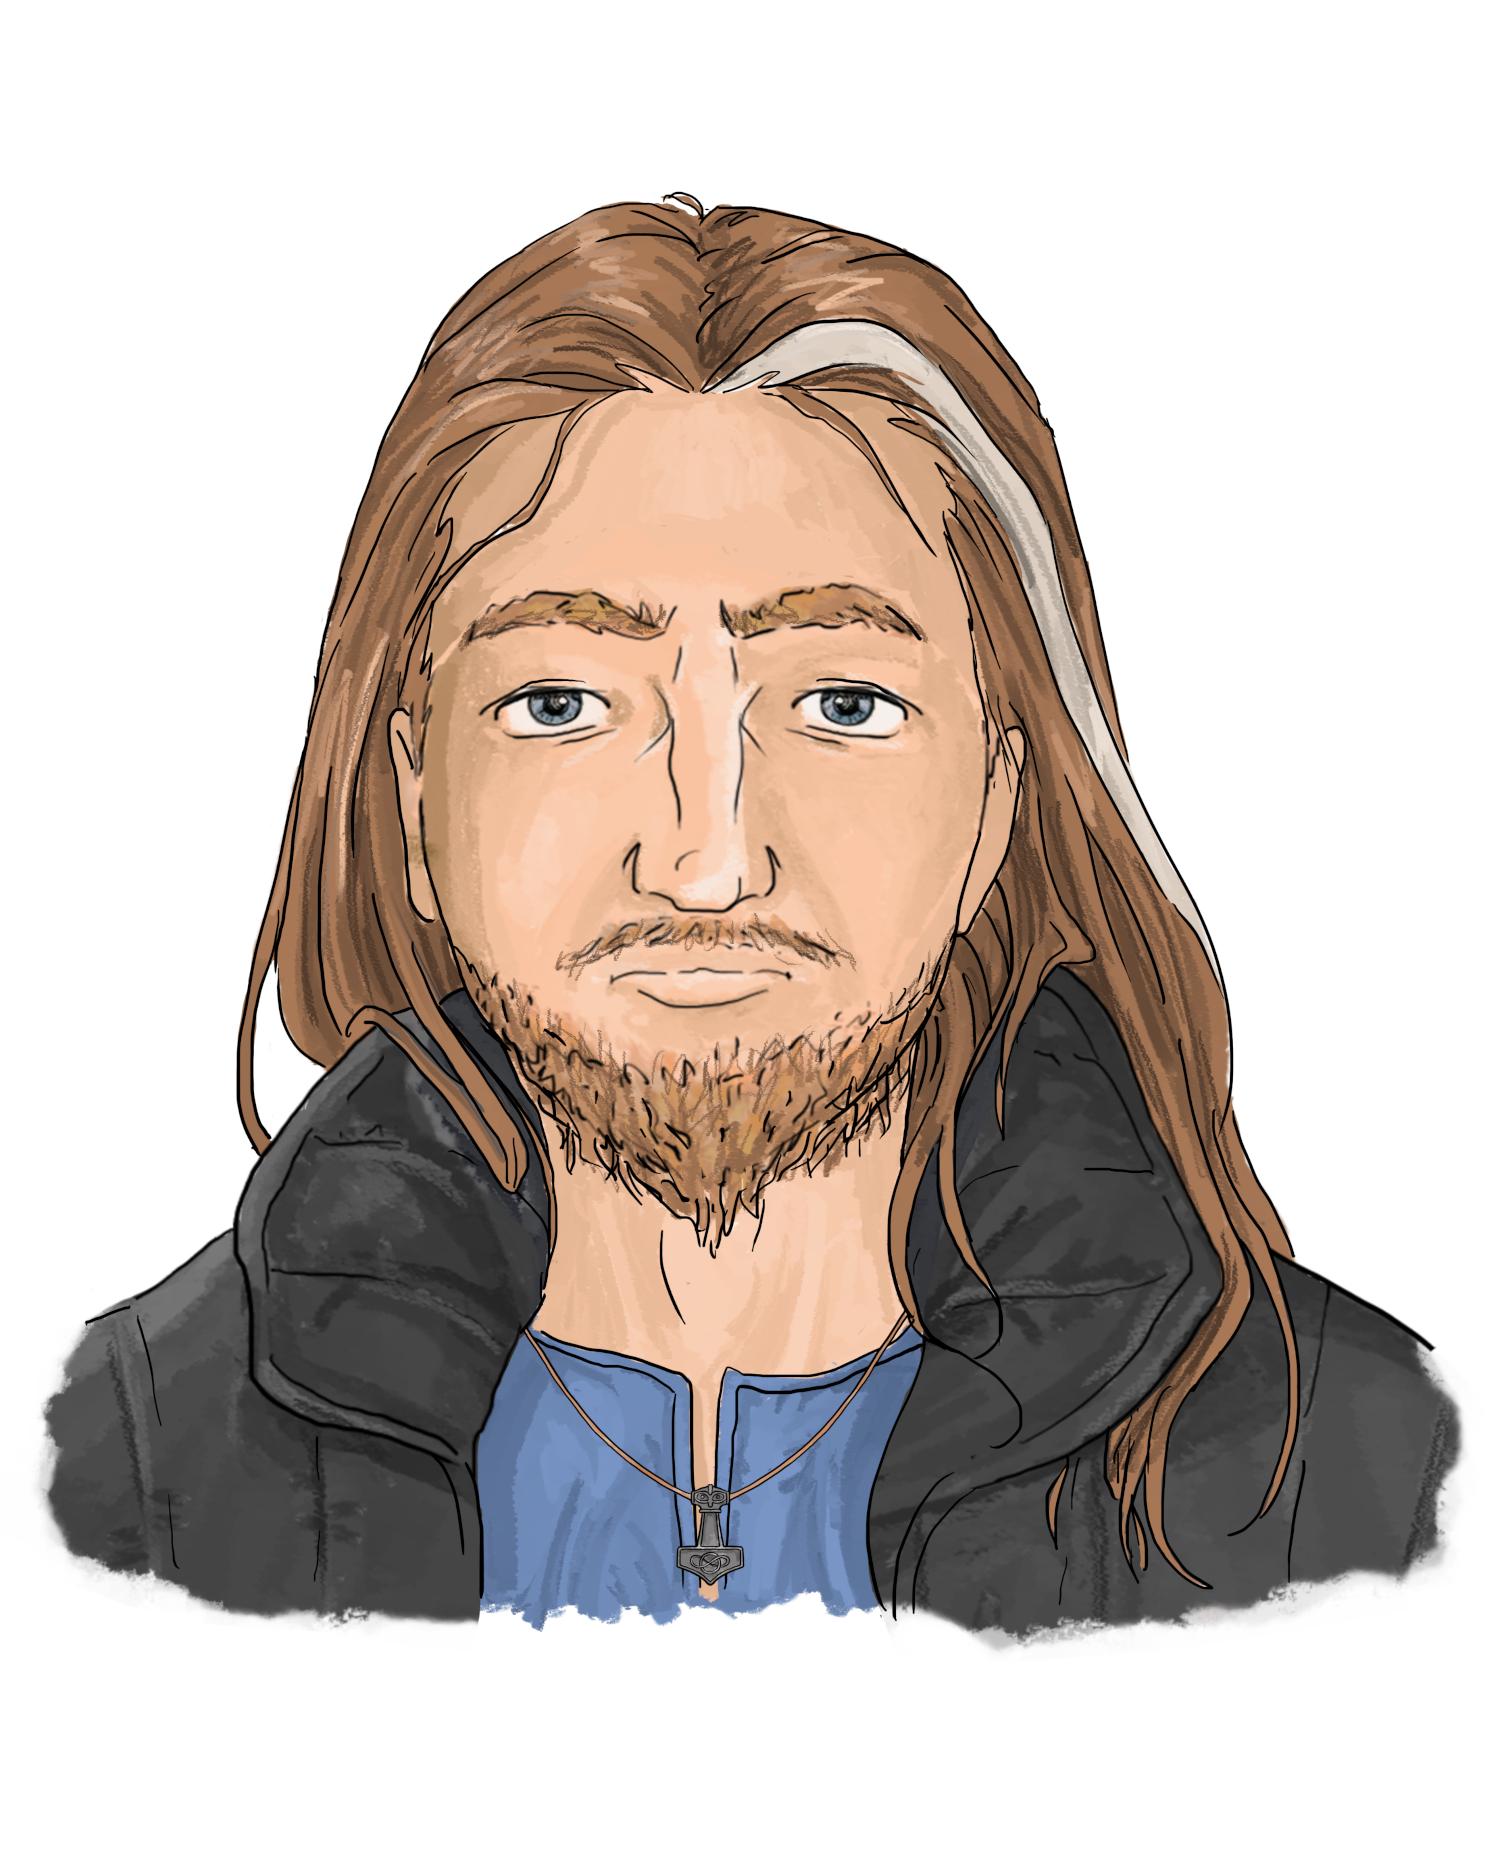 https://tintenwolf.mrkeks.net/satjira-project/index.php/Datei:Degordarak_dal_Randjasiz_(Portrait).jpg